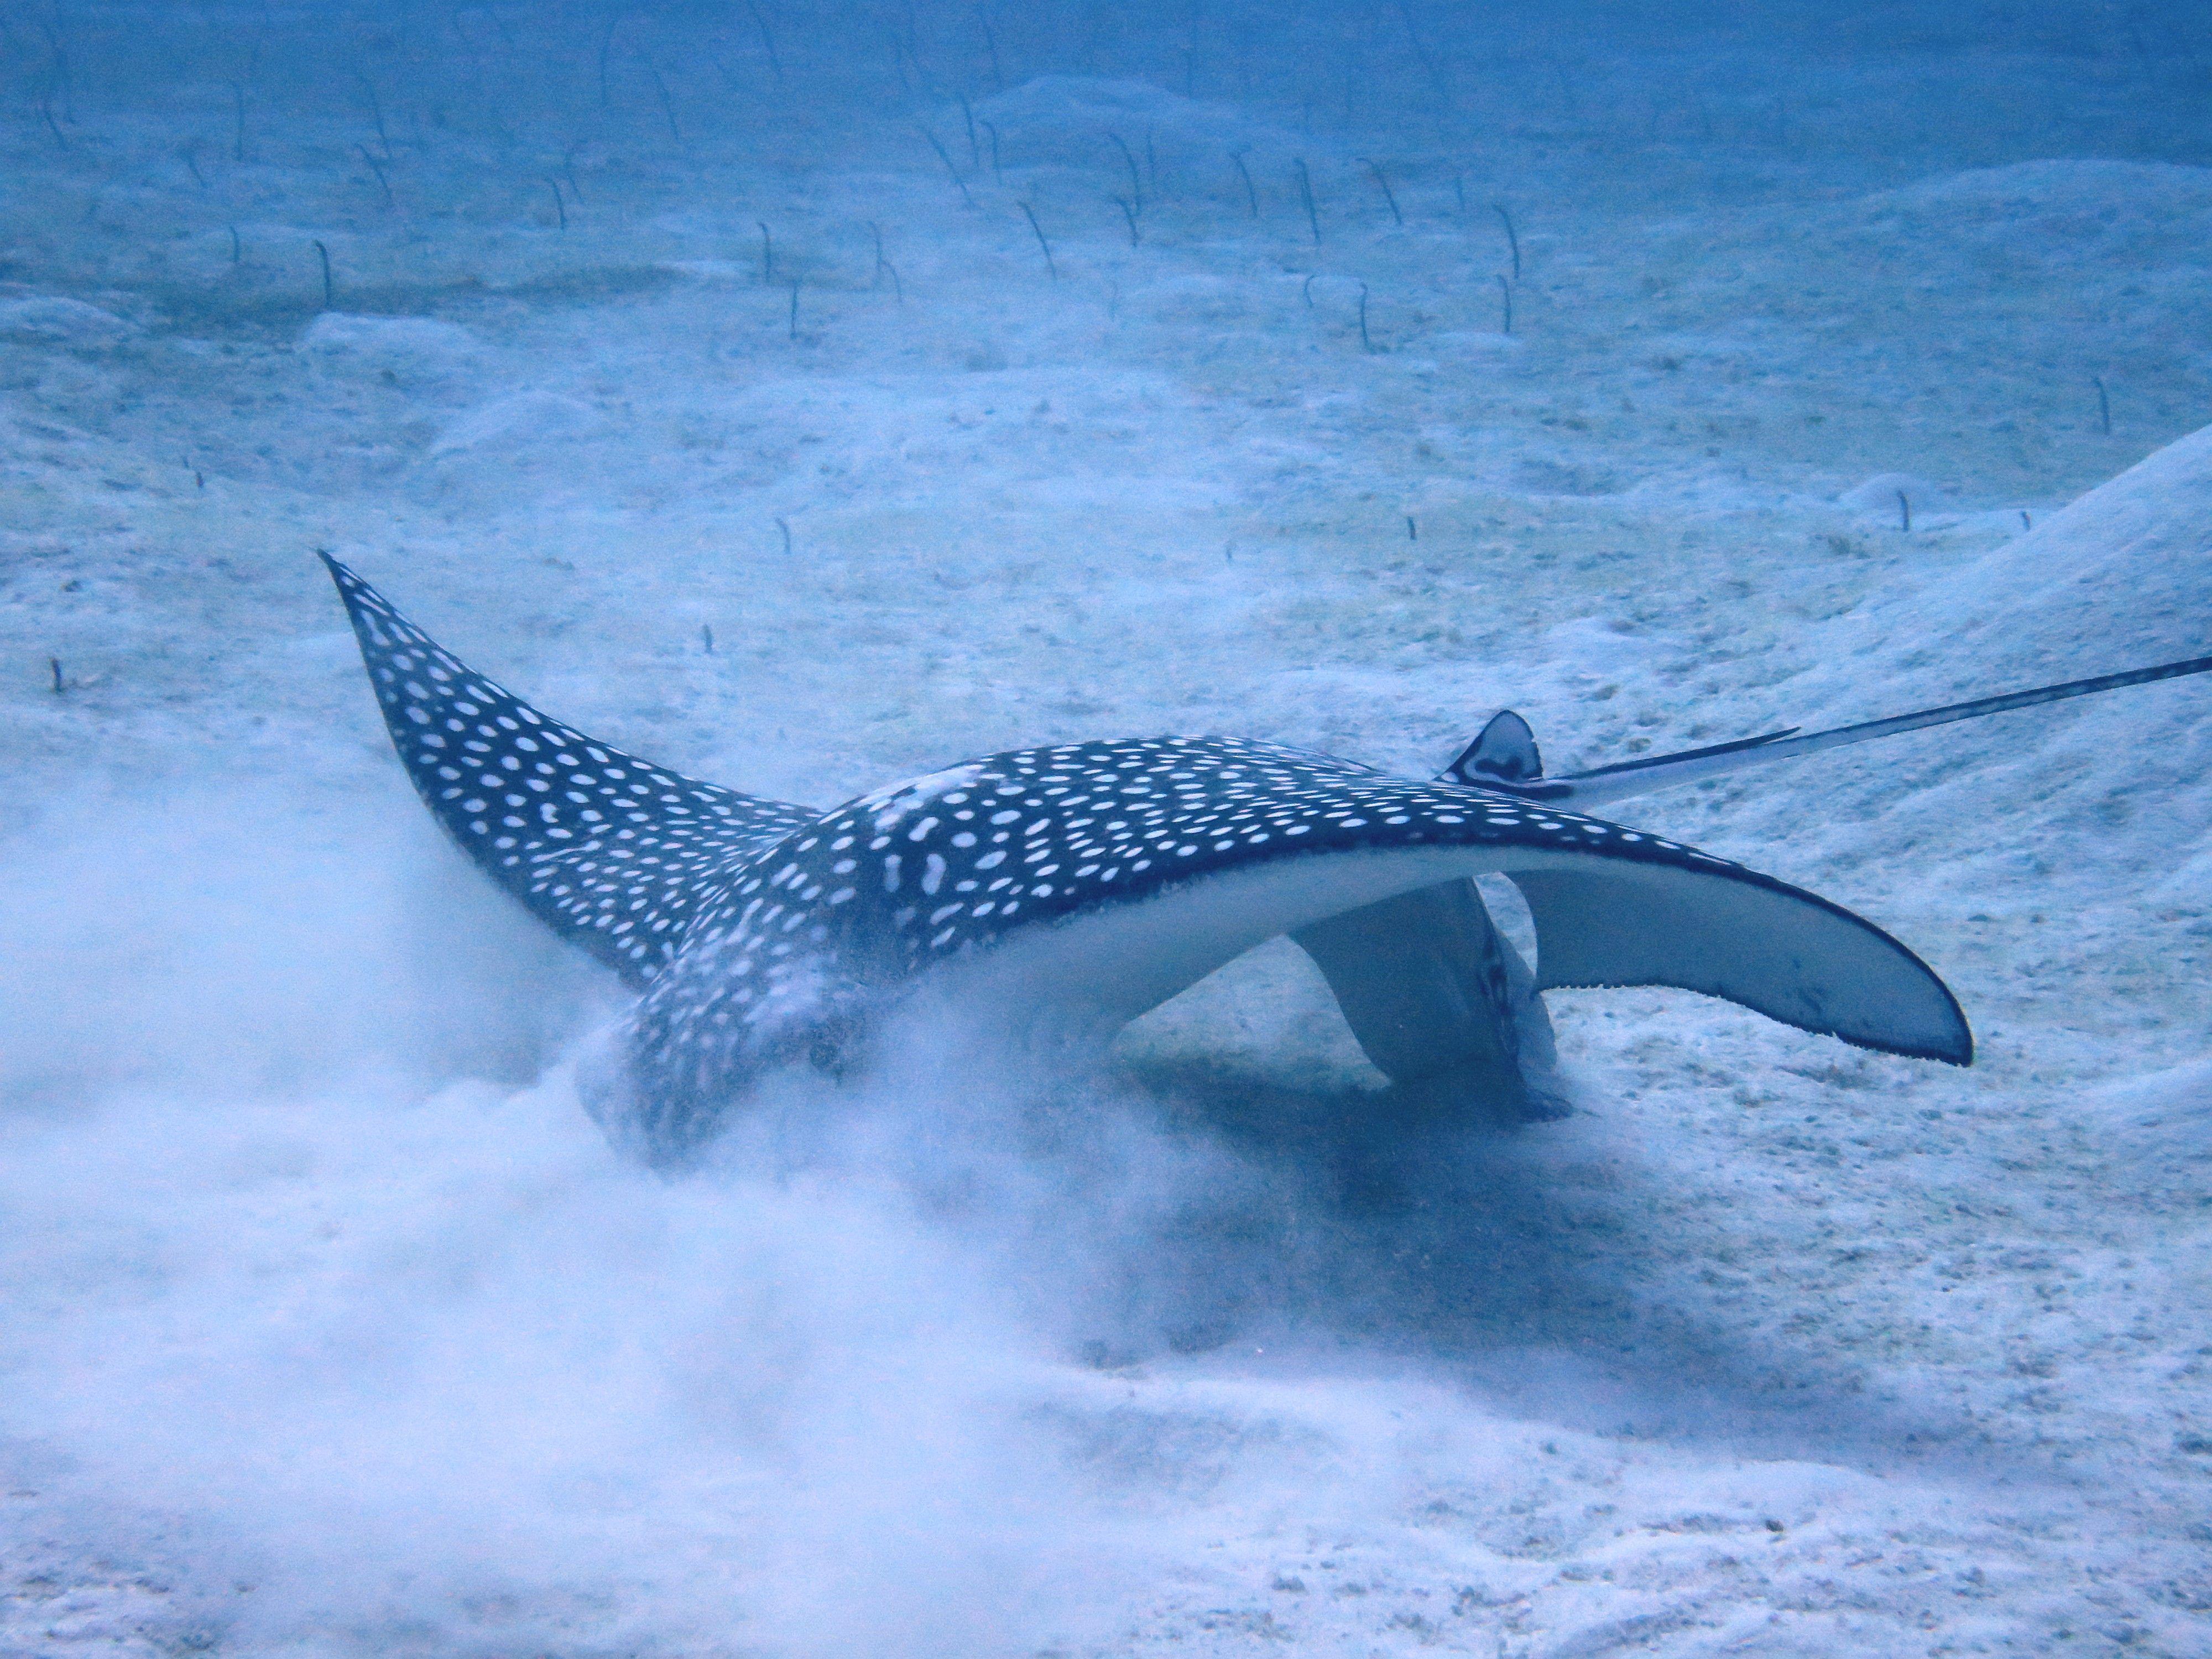 Spotted eagle ray feeding on garden eels - Cayman Islands